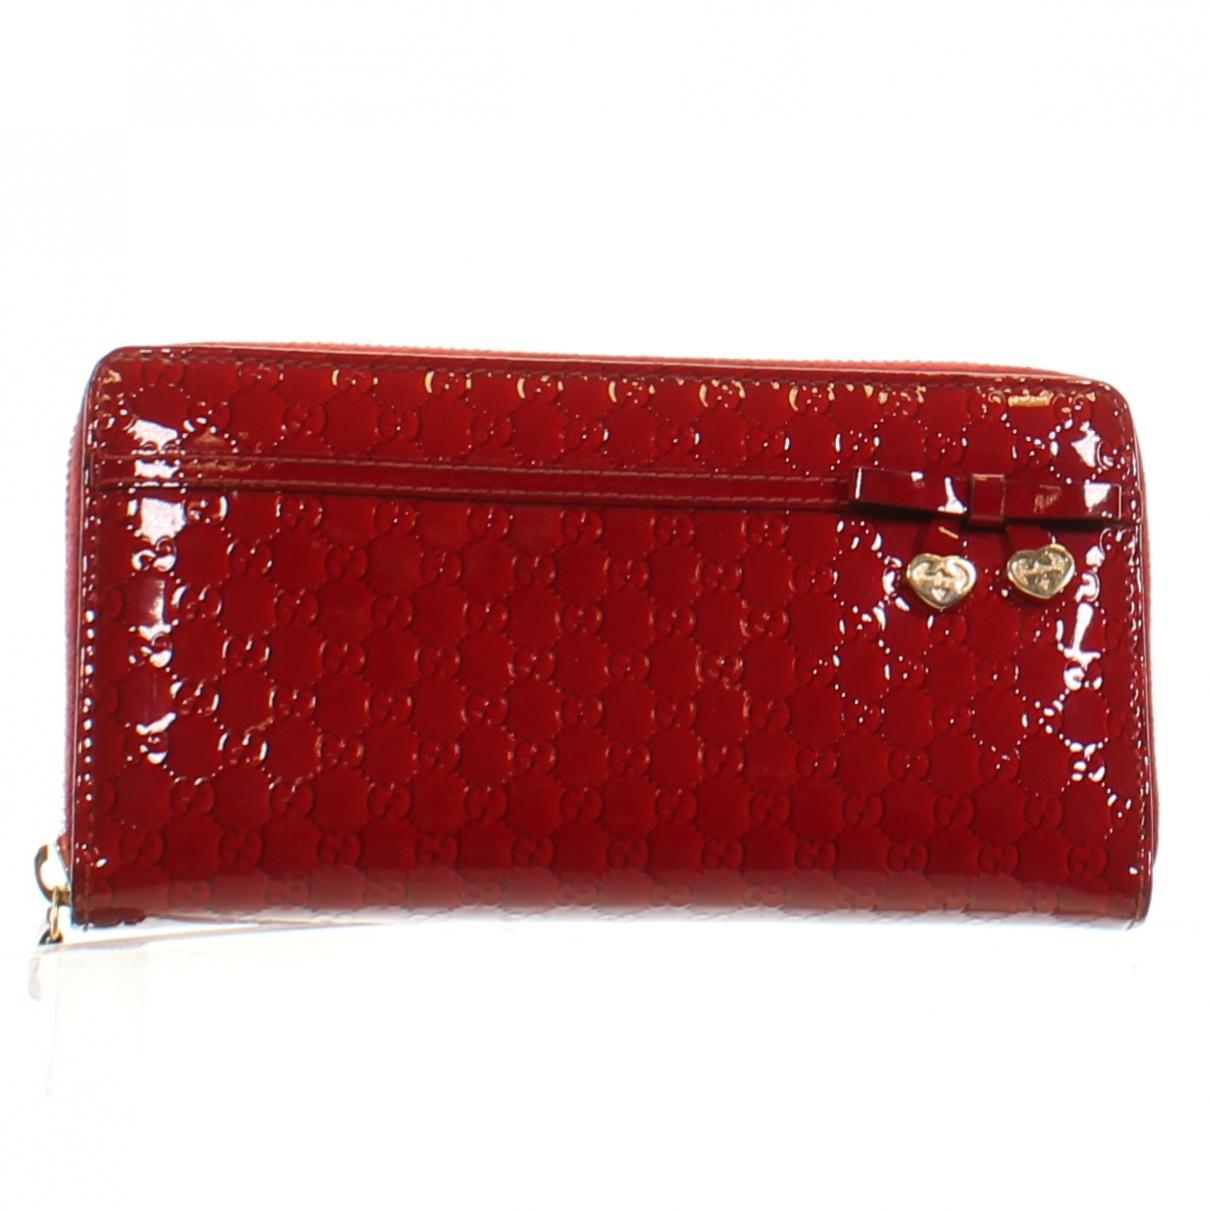 Gucci \N Portemonnaie in  Rot Lackleder